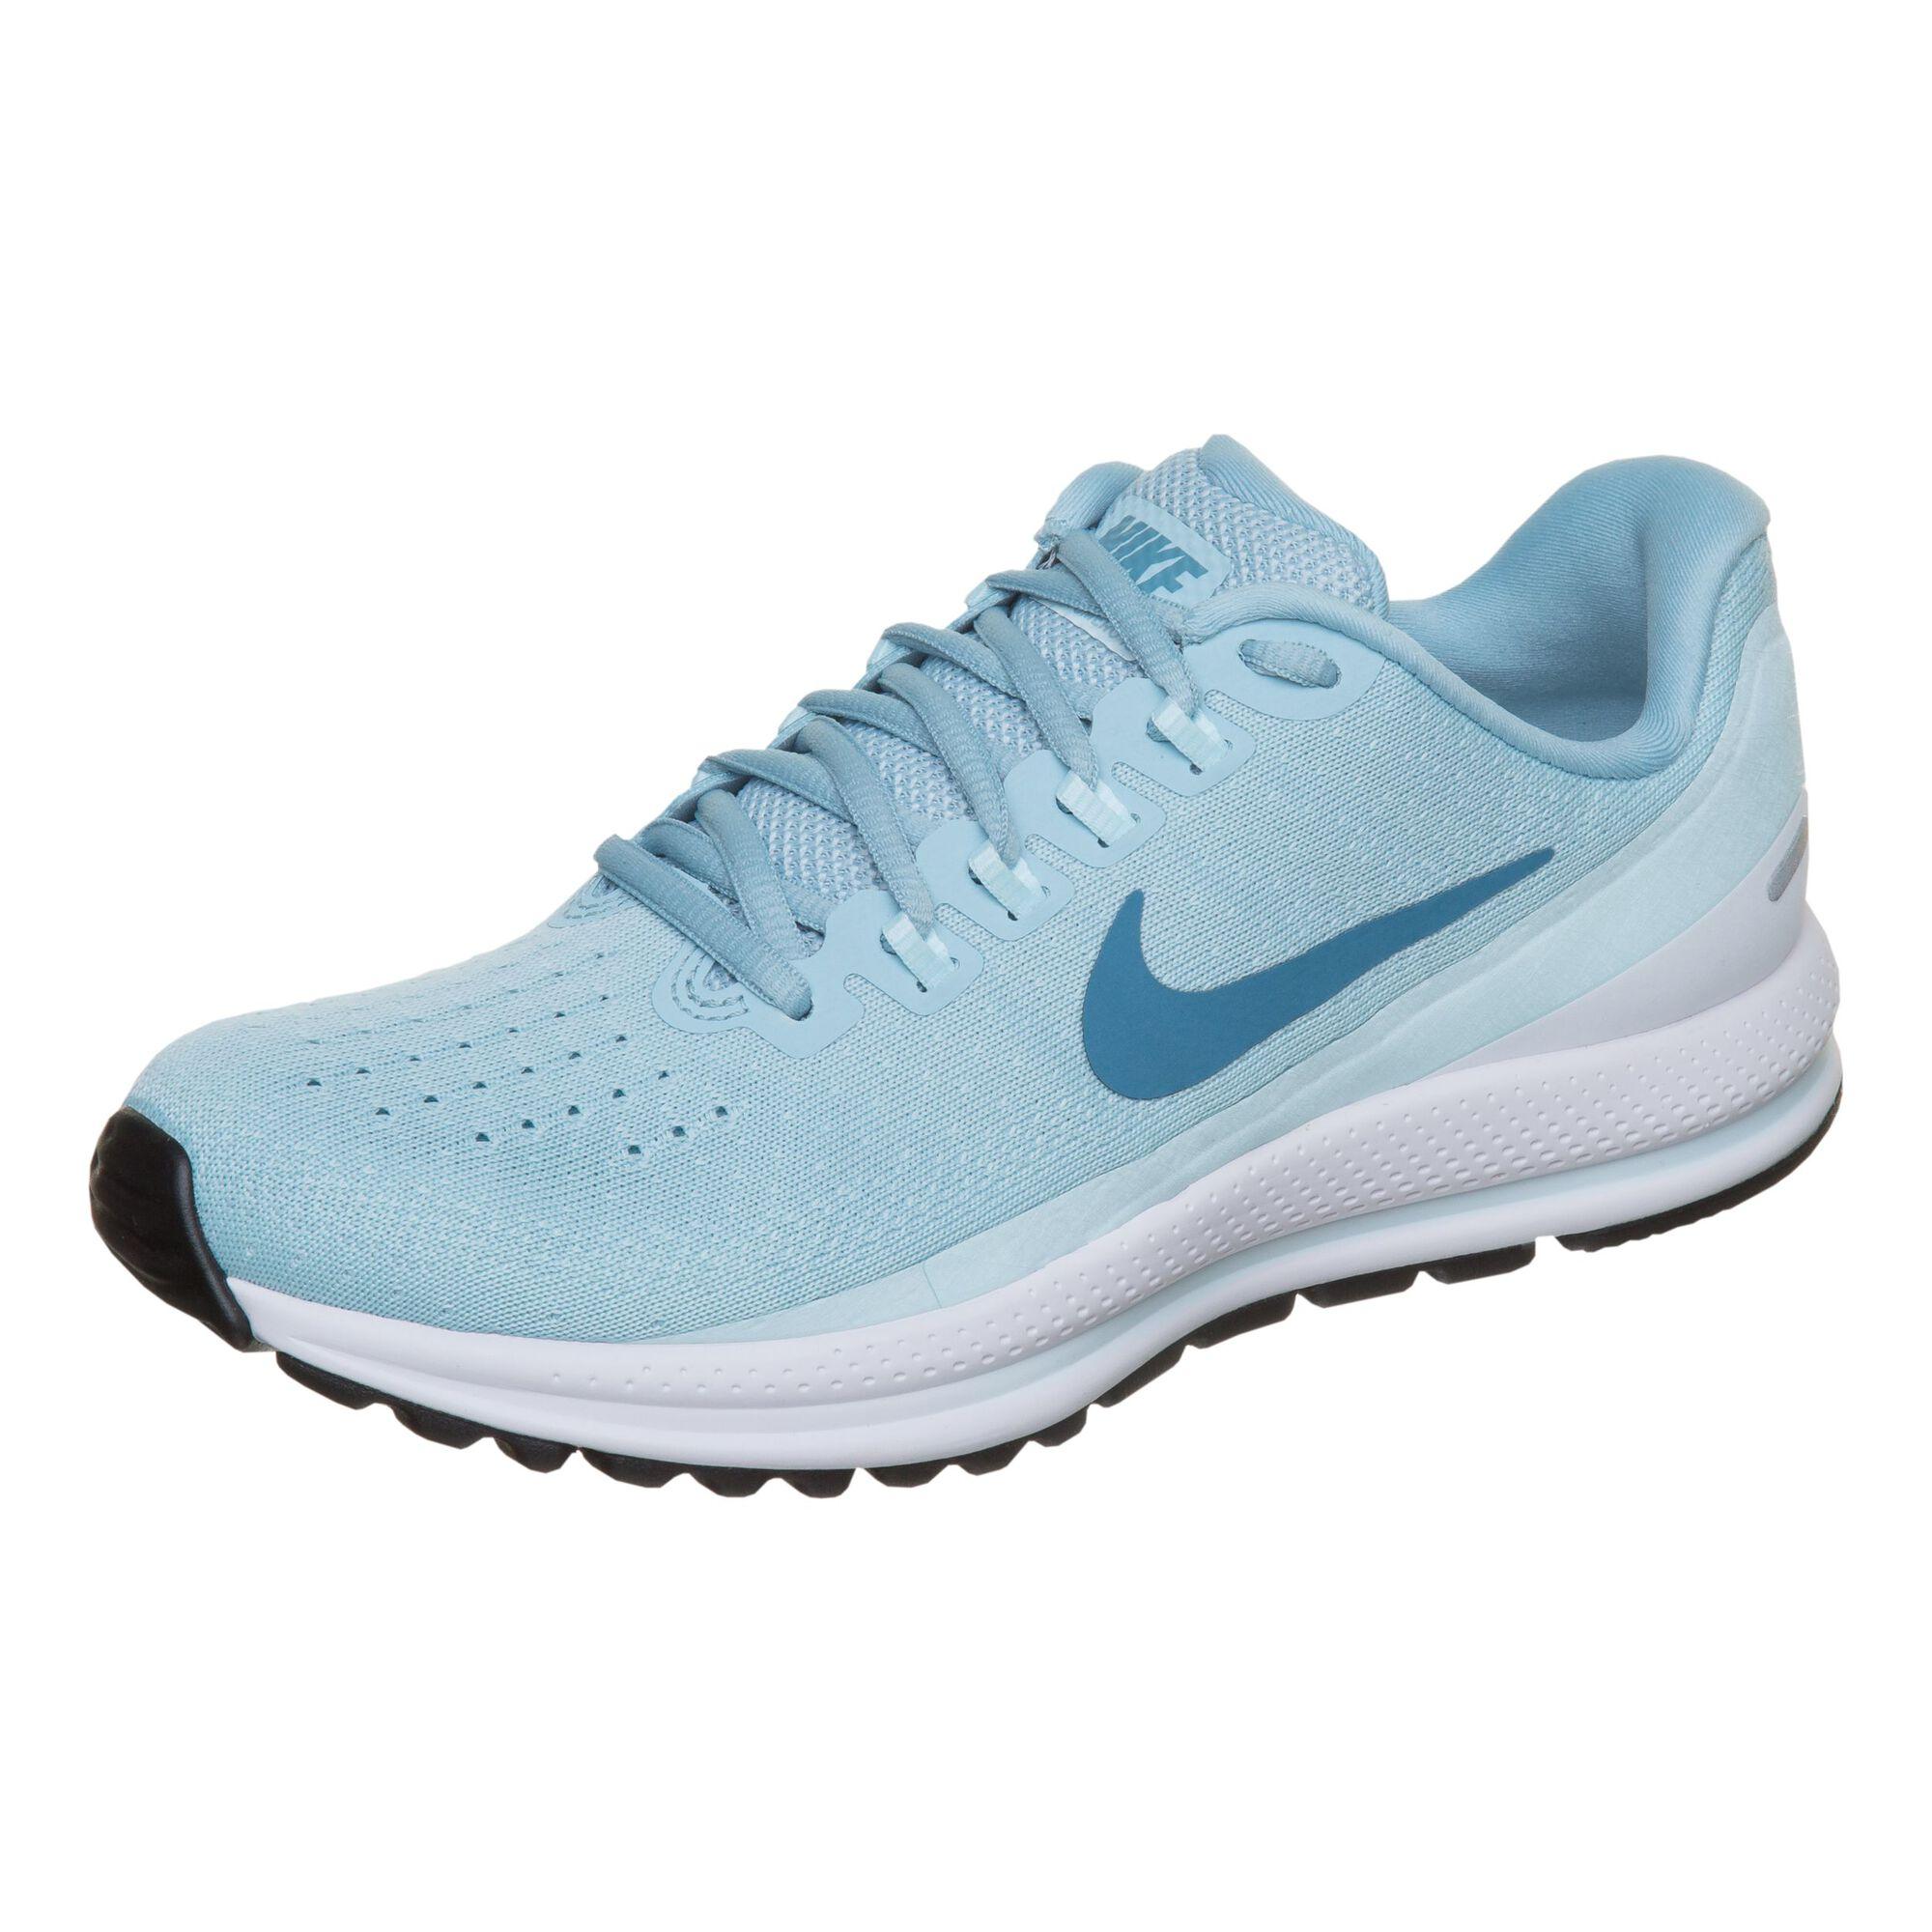 4abb3c1a6359 Nike  Nike  Nike  Nike  Nike  Nike  Nike  Nike  Nike  Nike. Air Zoom Vomero  13 ...